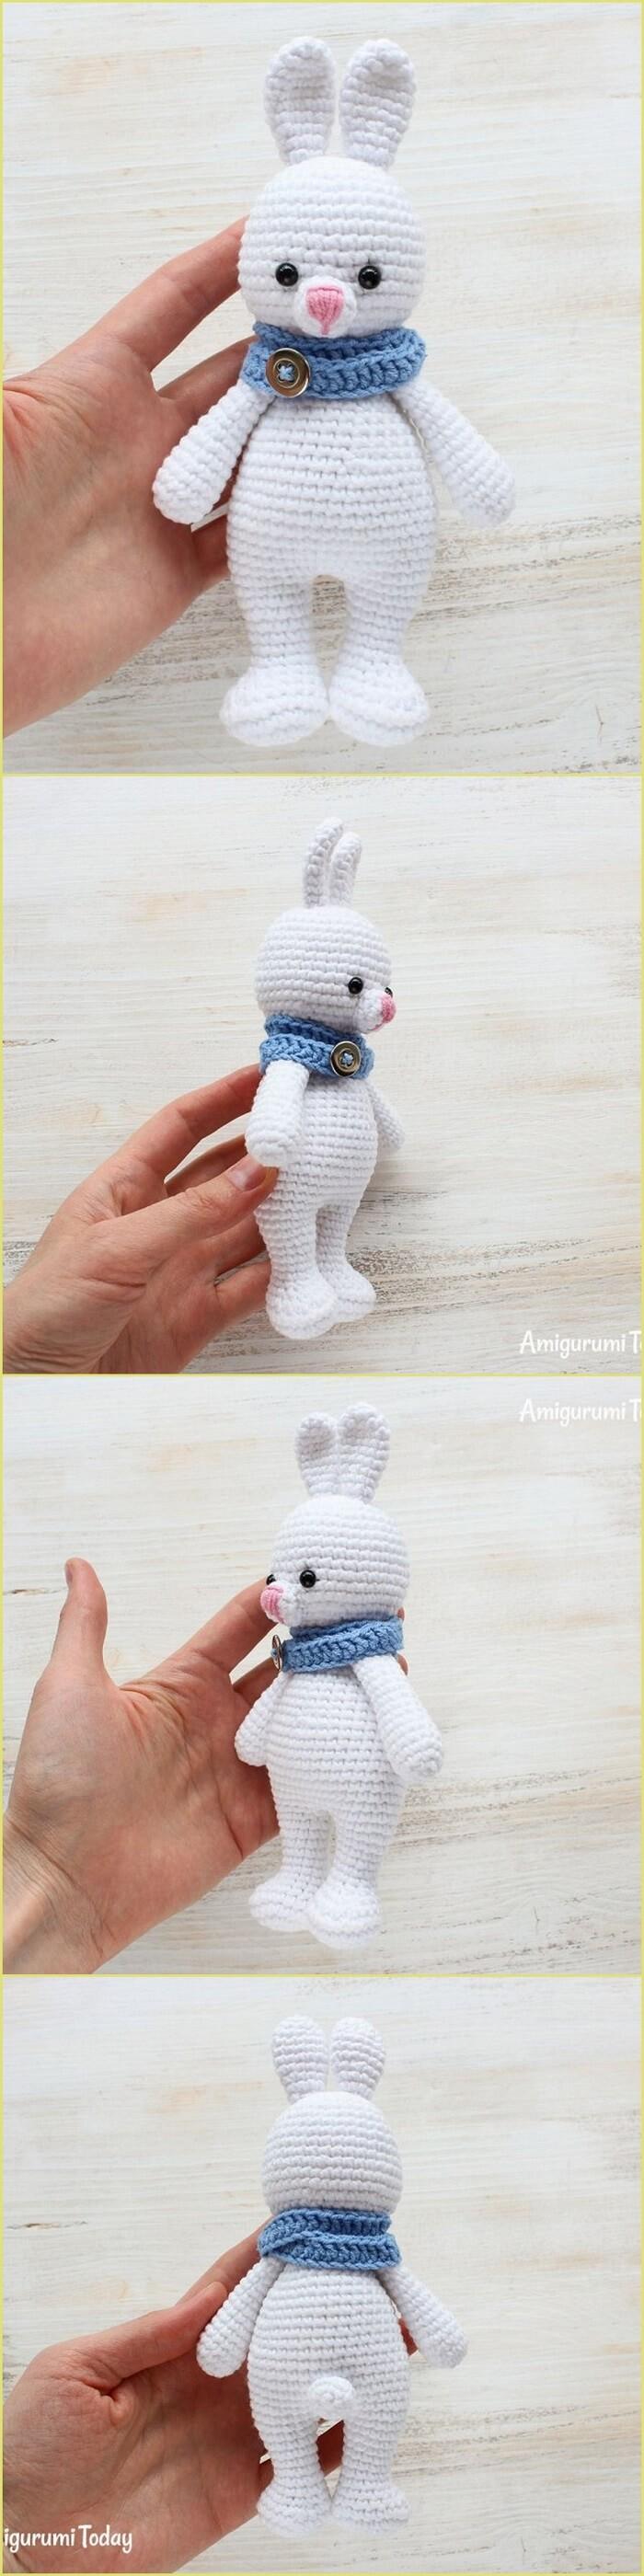 Crochet toys Ideas-5